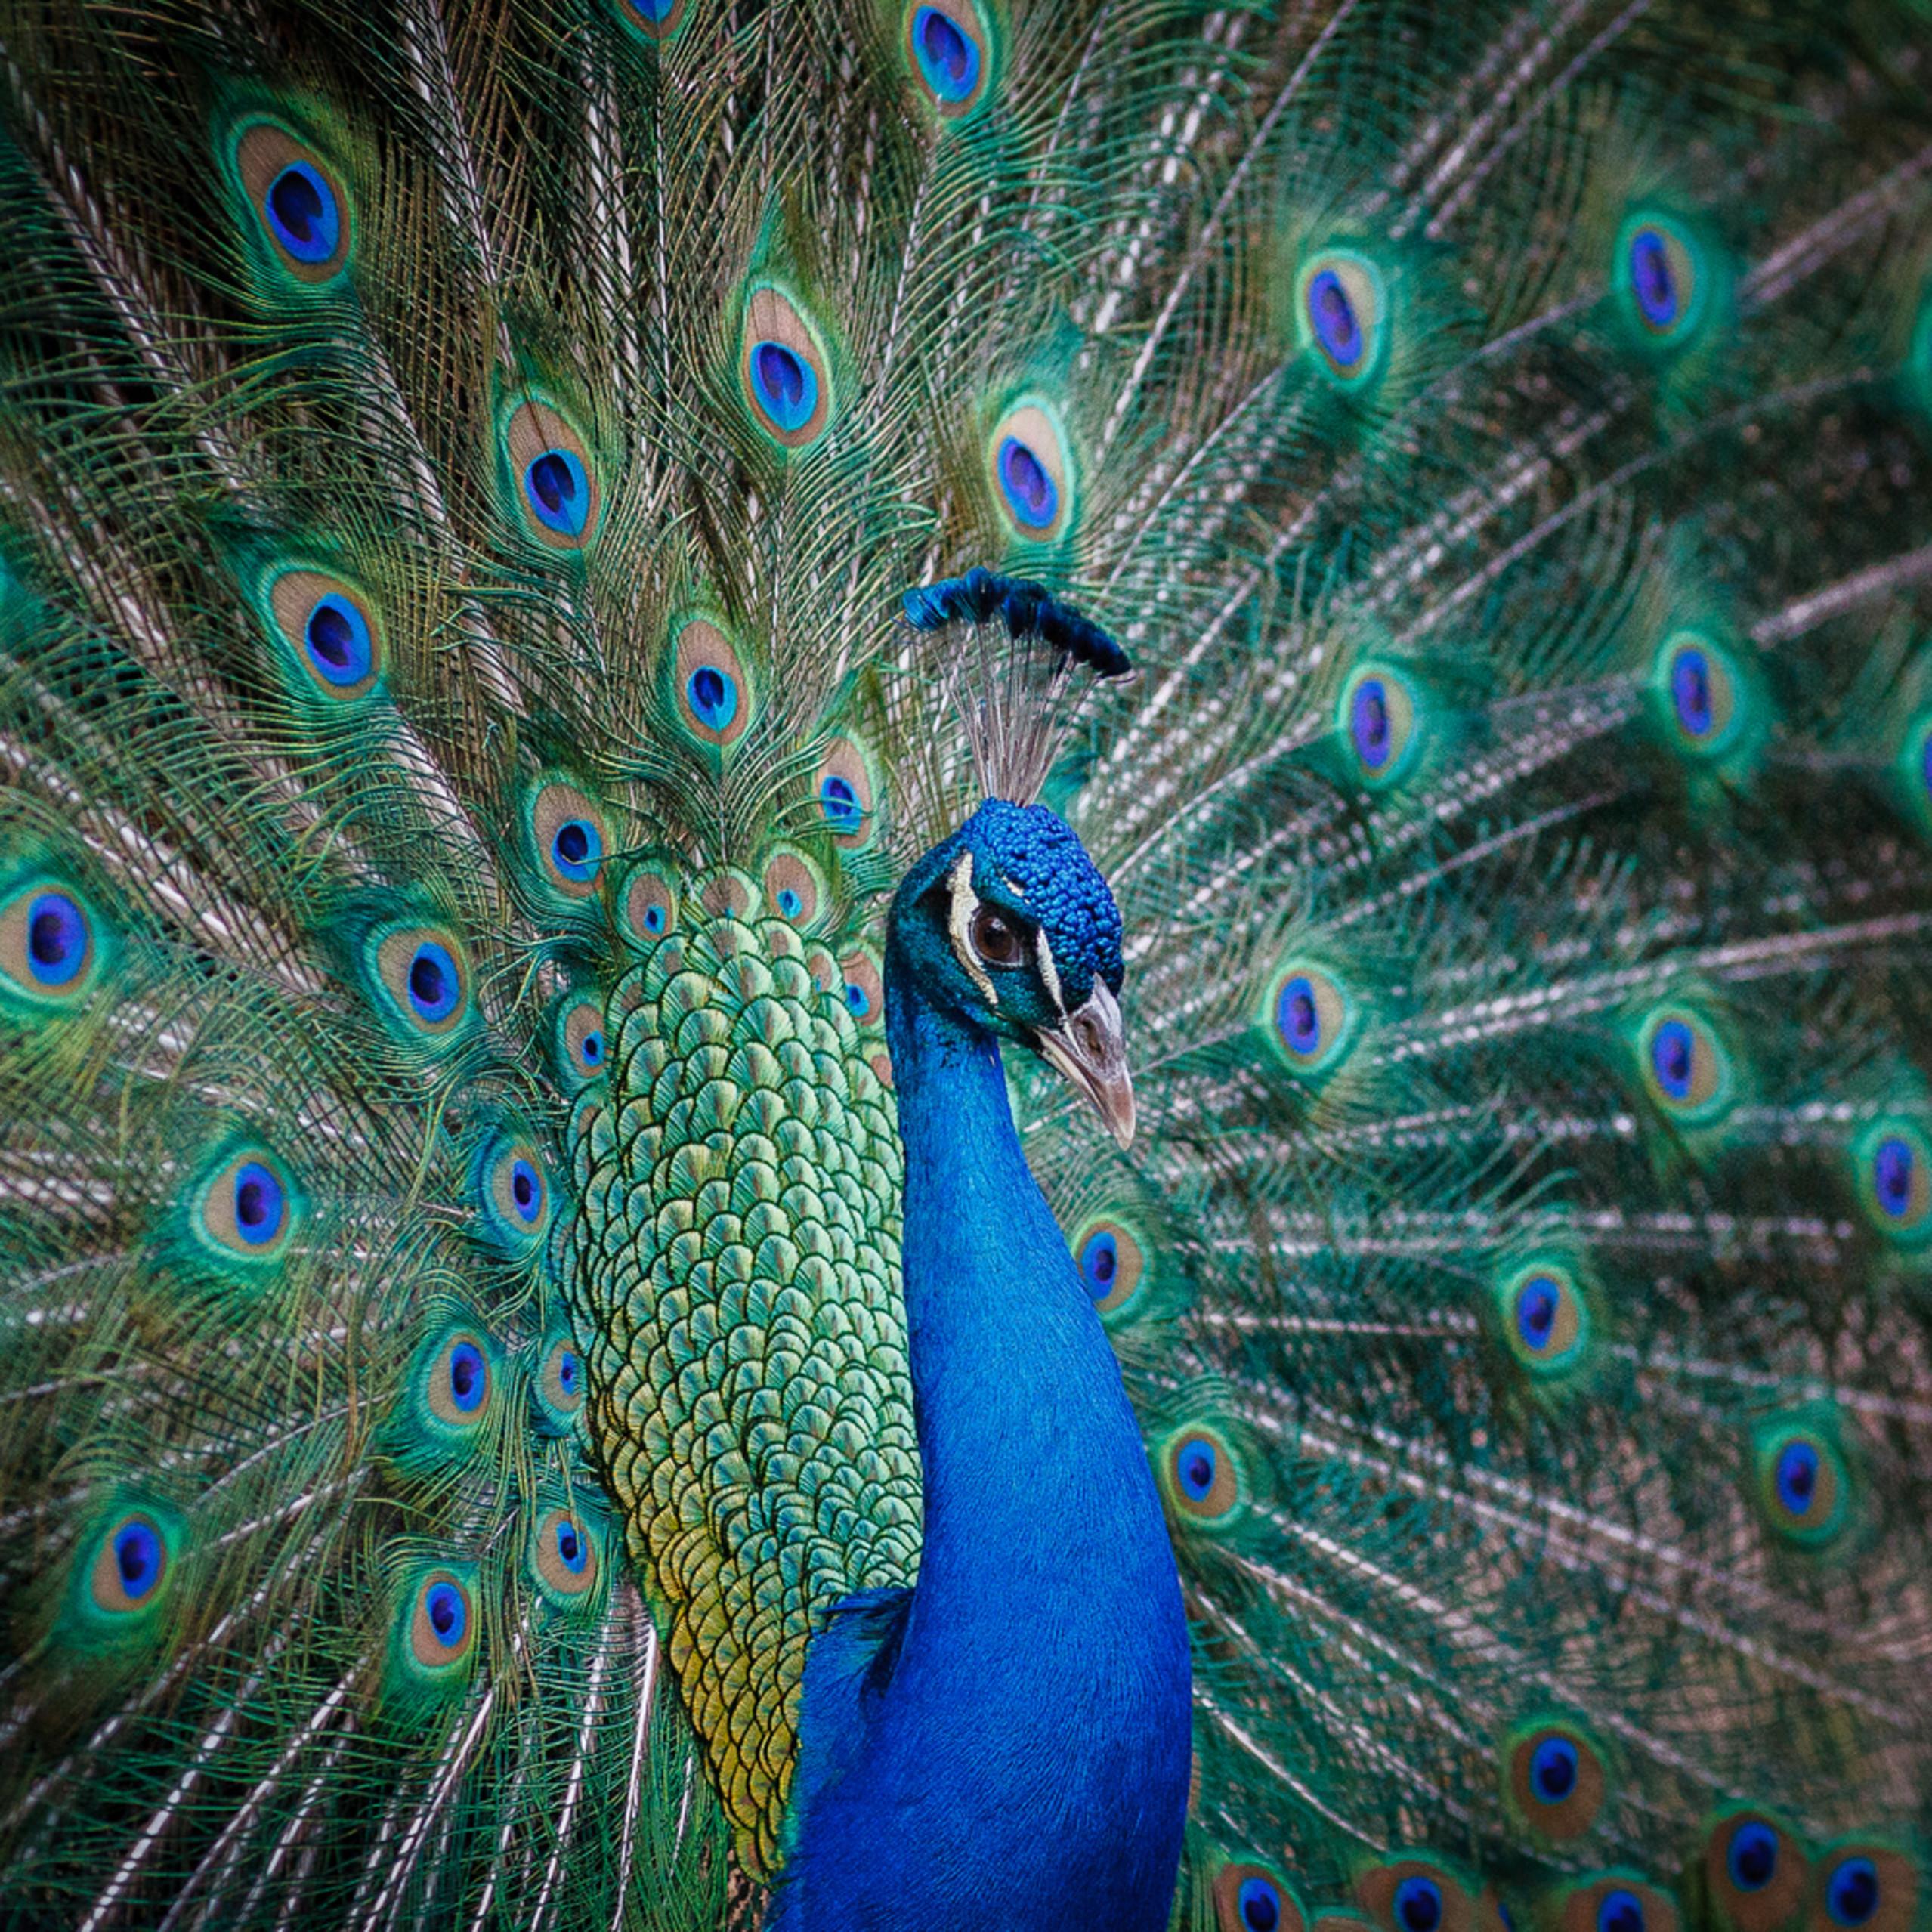 Peacock 001 zwfhfr